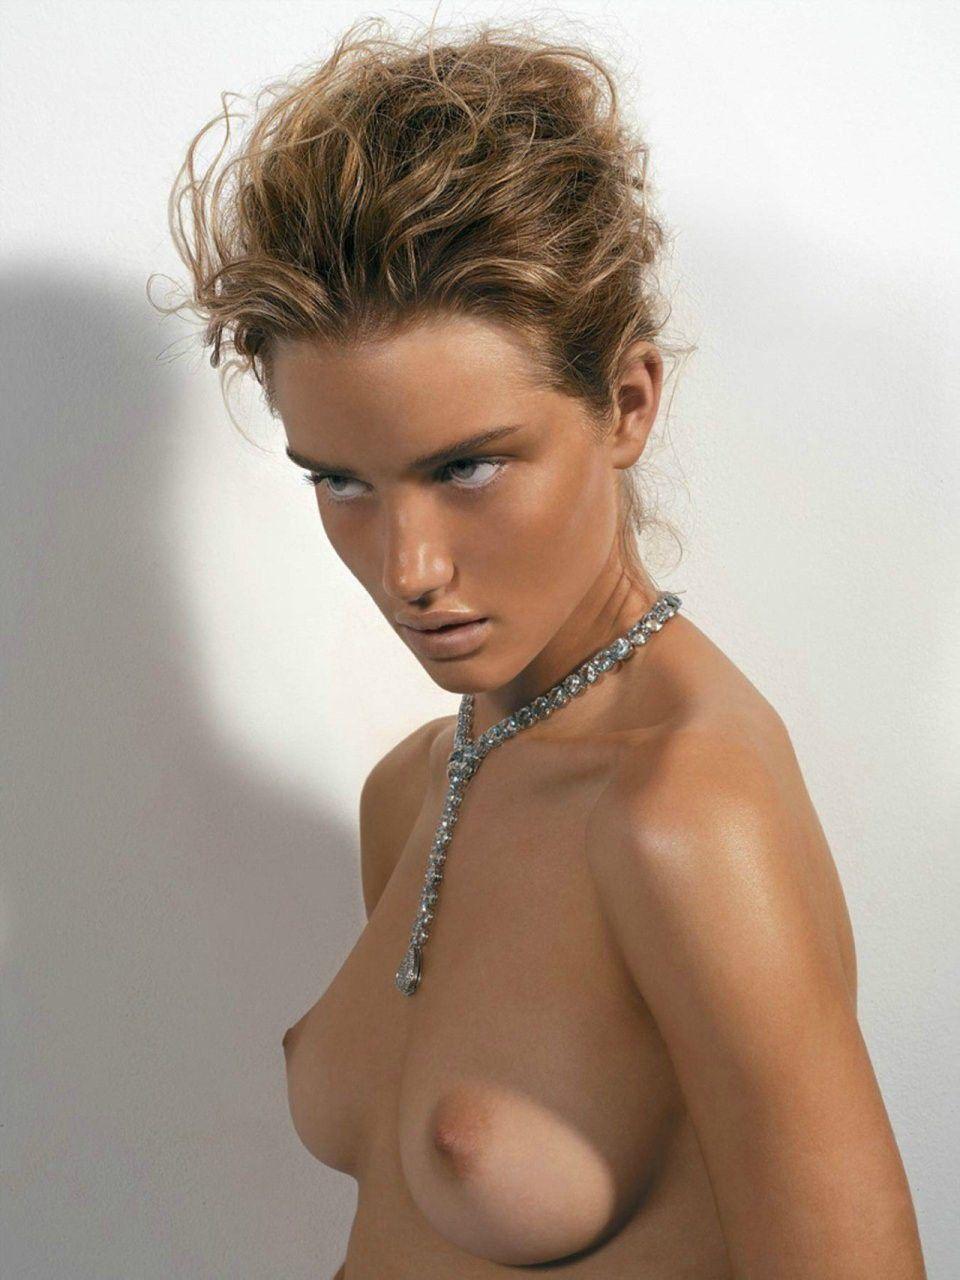 tube8 Rosie Huntington Whiteley Nude Photo Shoot